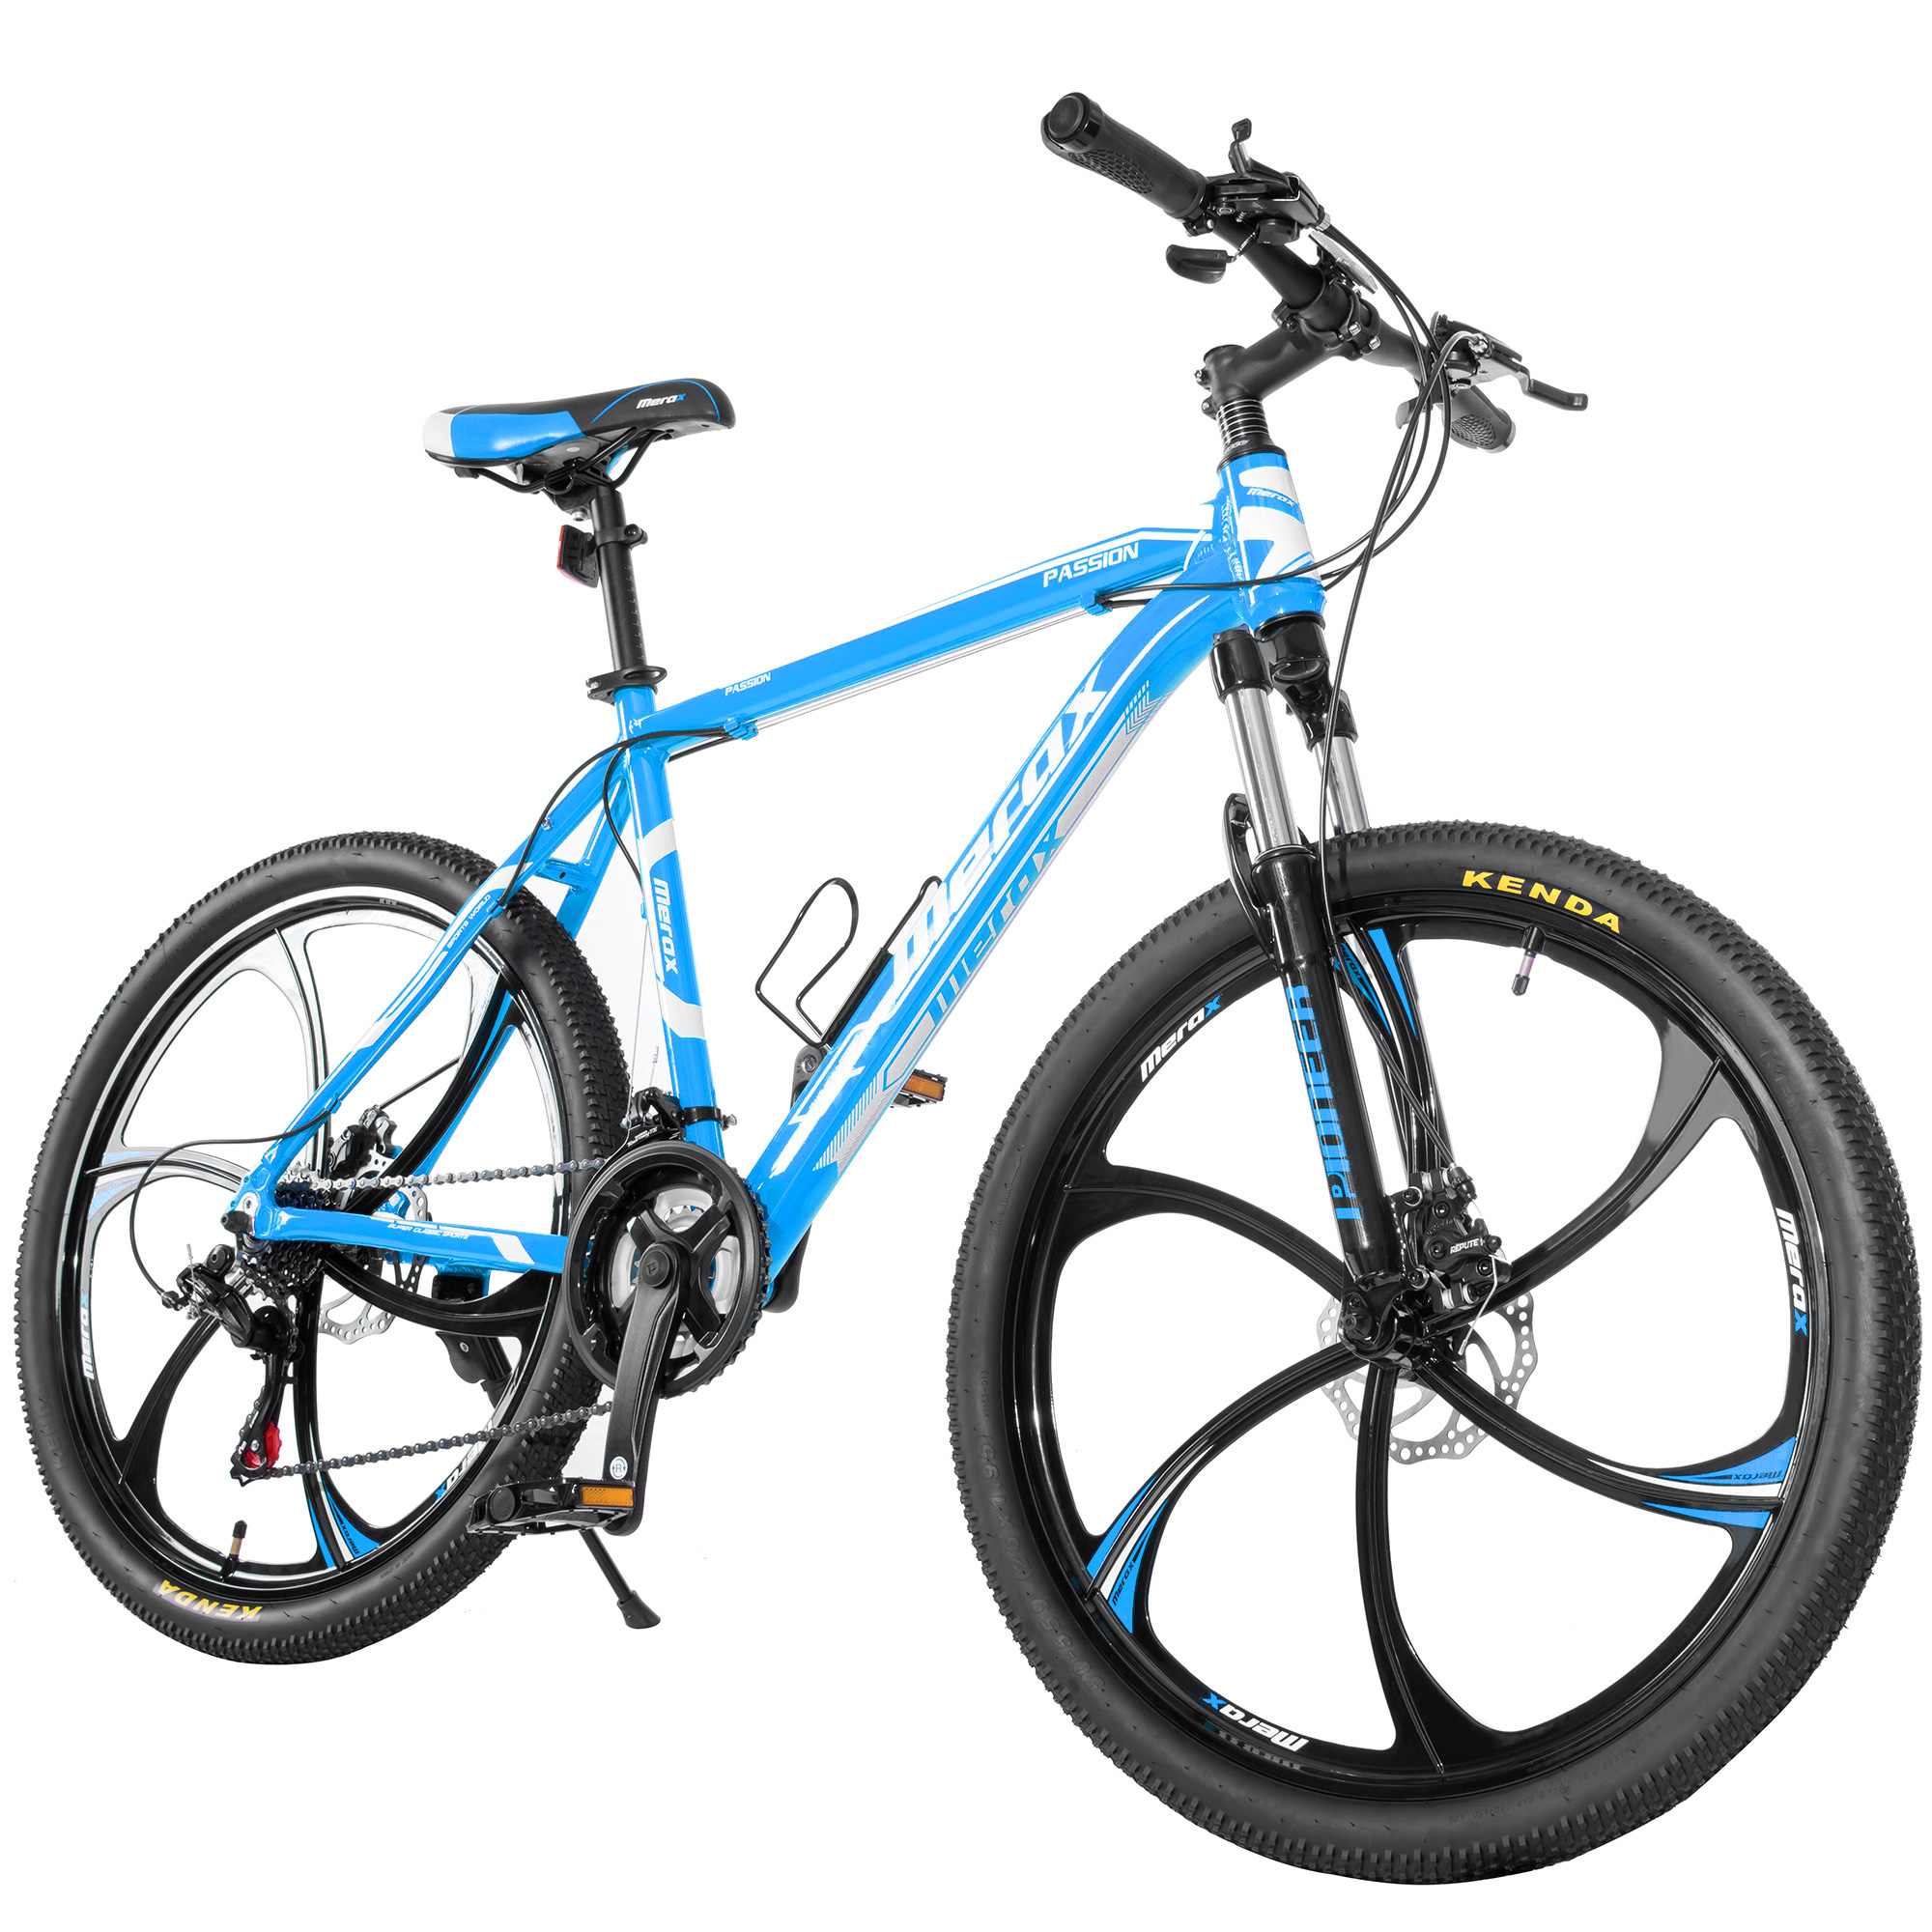 "Merax Finiss 26"" Aluminum 21 Speed Magnesium Alloy Wheel Mountain Bike"